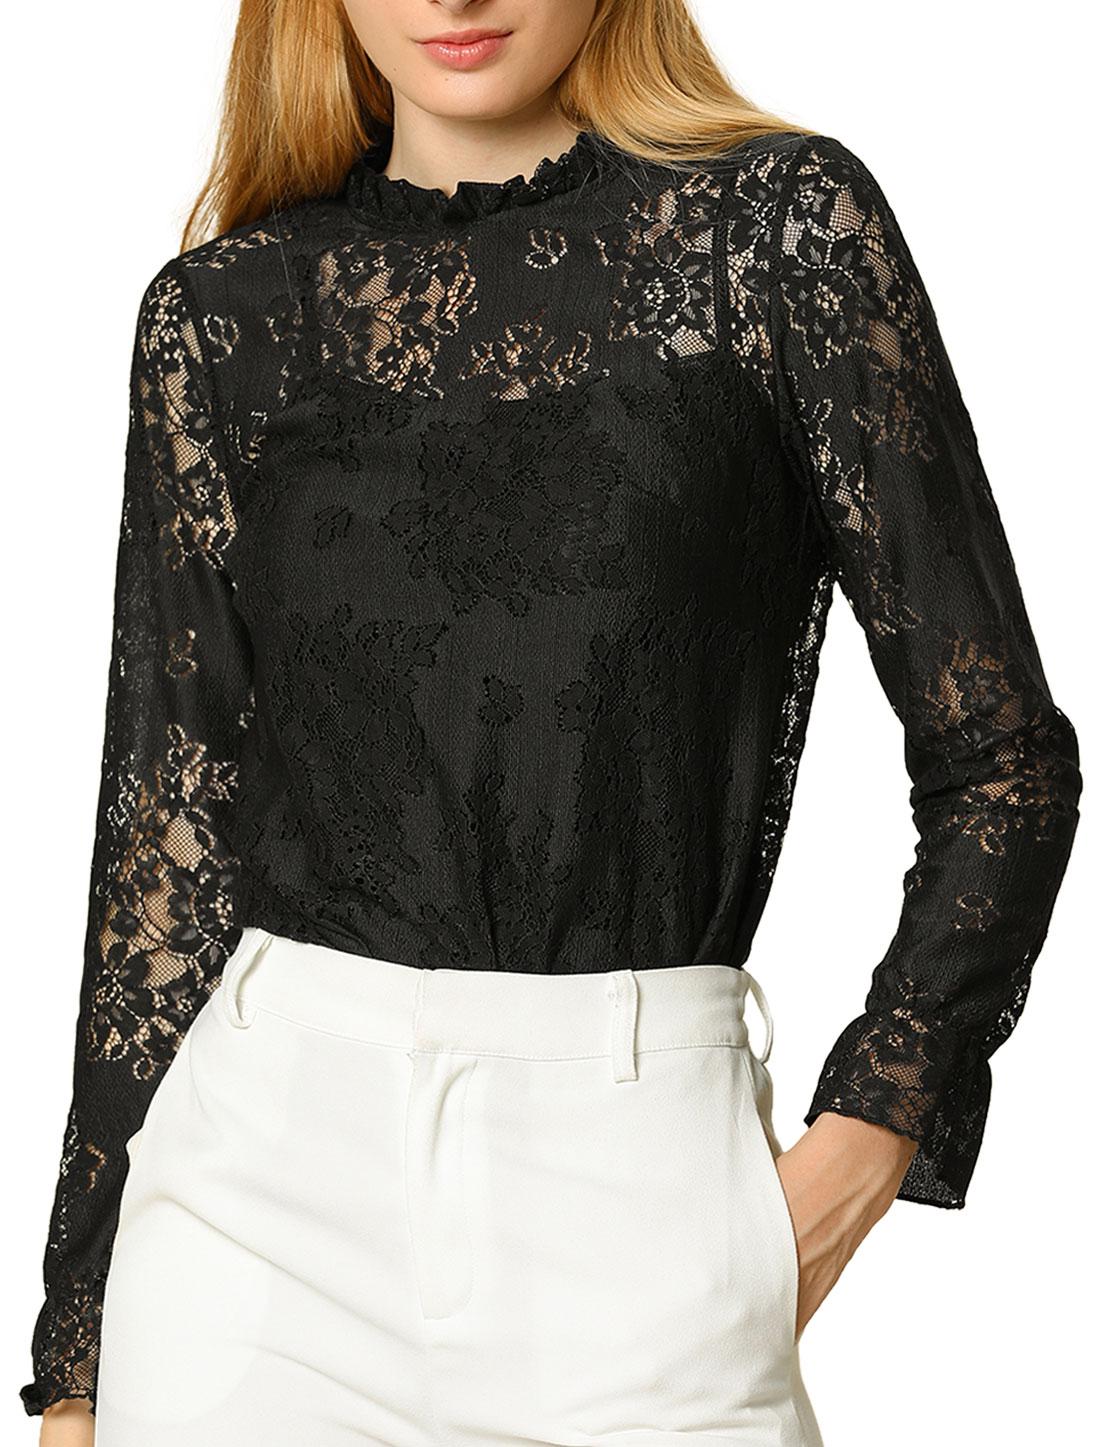 Allegra K Womens Lace Sheer Floral Color Block Blouse Black XS (US 2)